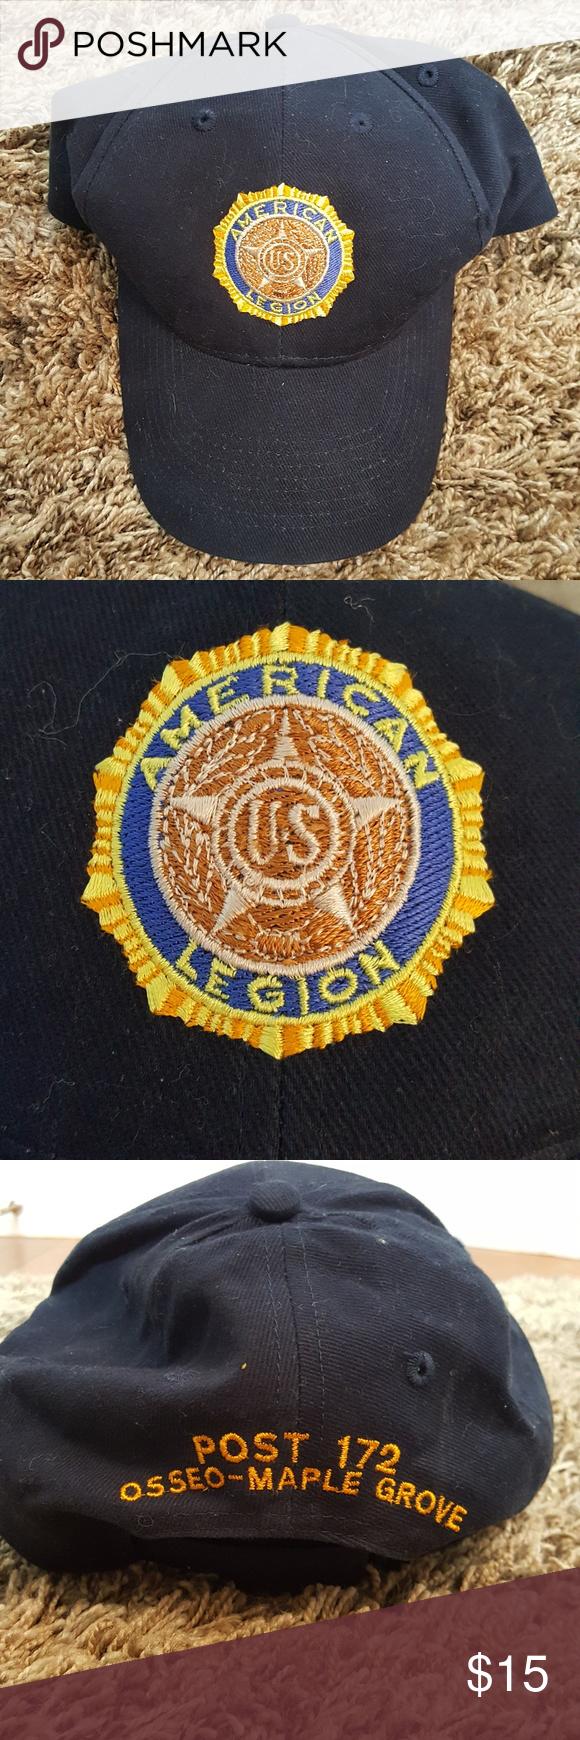 Vintage Legion Baseball Hat Amazing Perfect Clothes Design American Vintage Baseball Hats